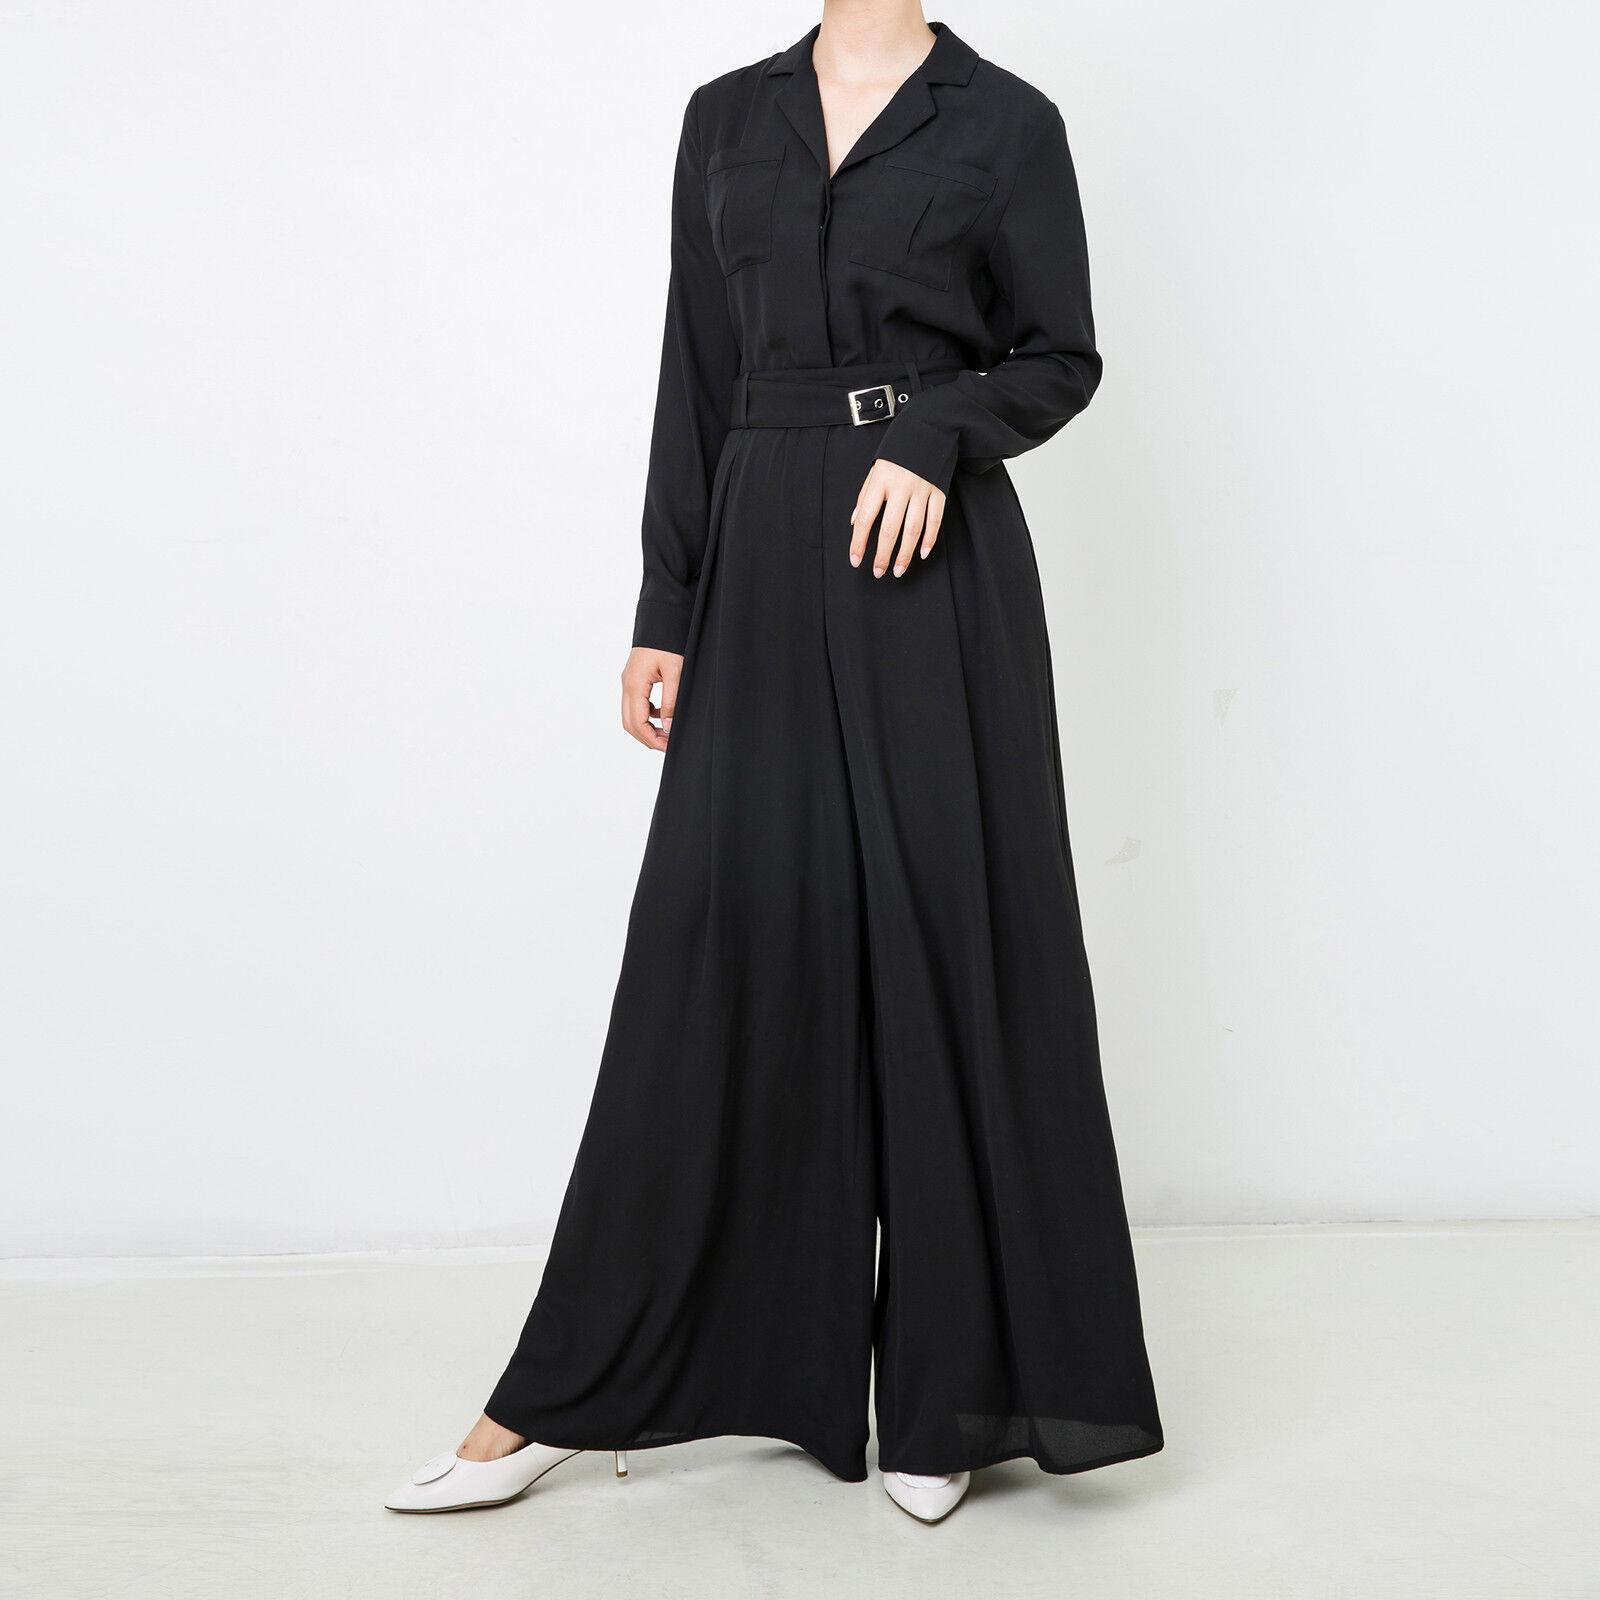 New Muslim Women Ladies Wide Leg Jumpsuit Long Sleeve Party Romper Size XS-XXL